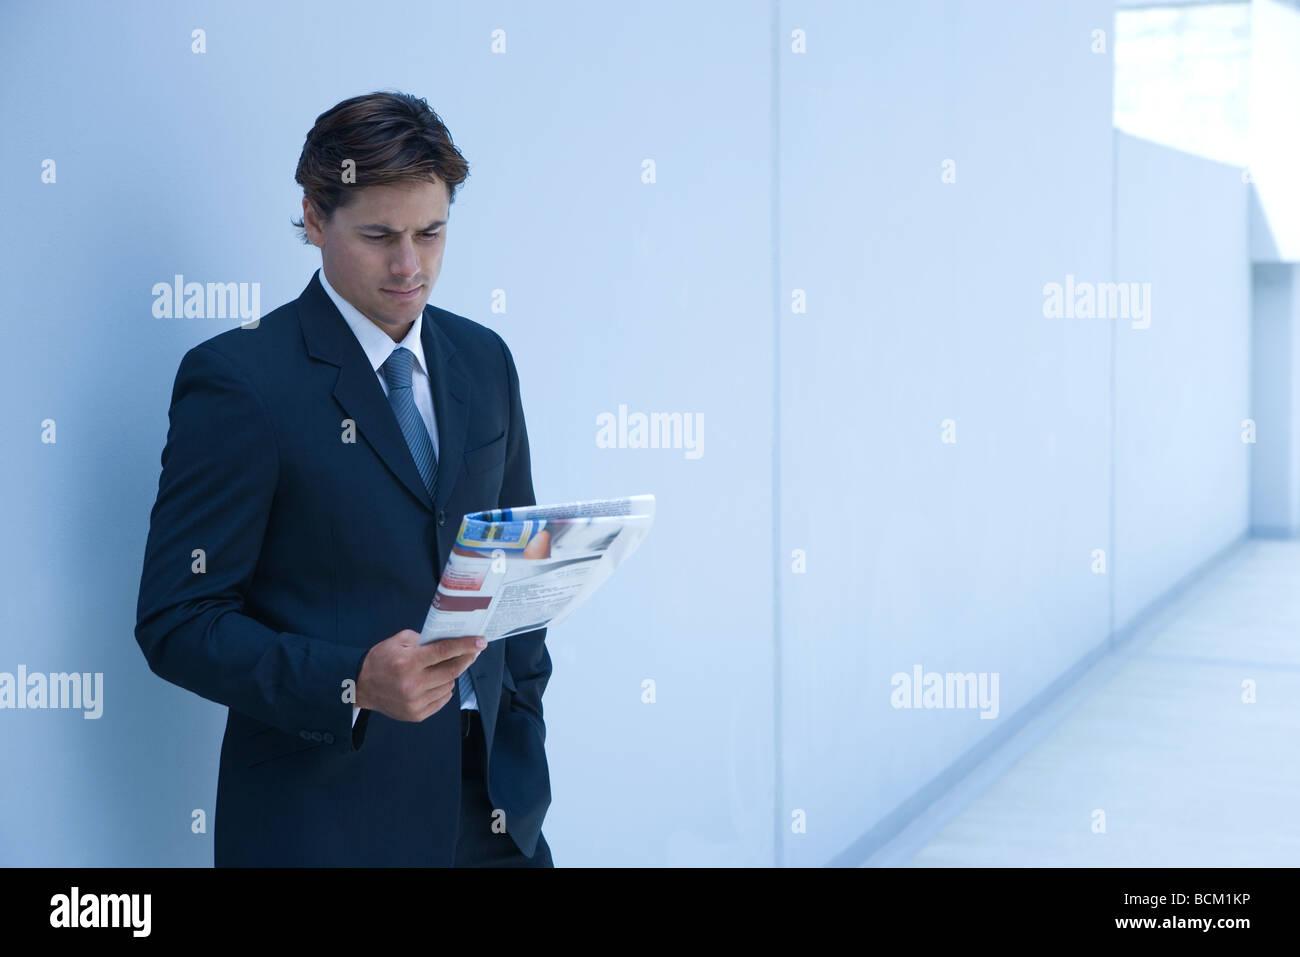 Businessman standing, reading newspaper Photo Stock